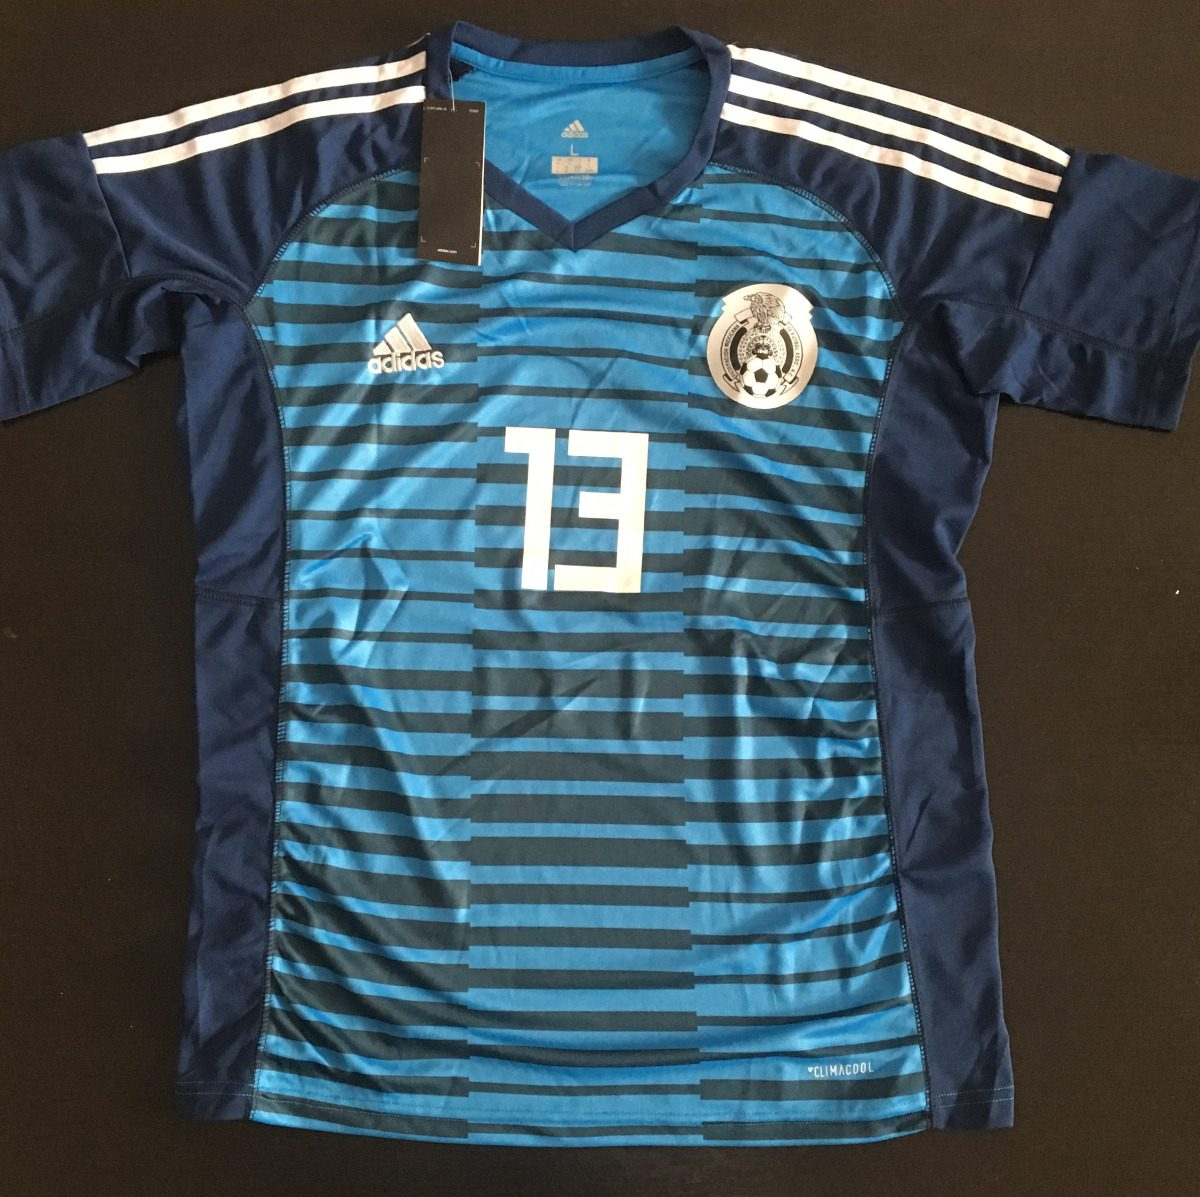 34b933f7551b2 Fabuloso jersey mexico portero azul ochoa talavera cargando zoom jpg  1200x1197 Jersey portero de mexico